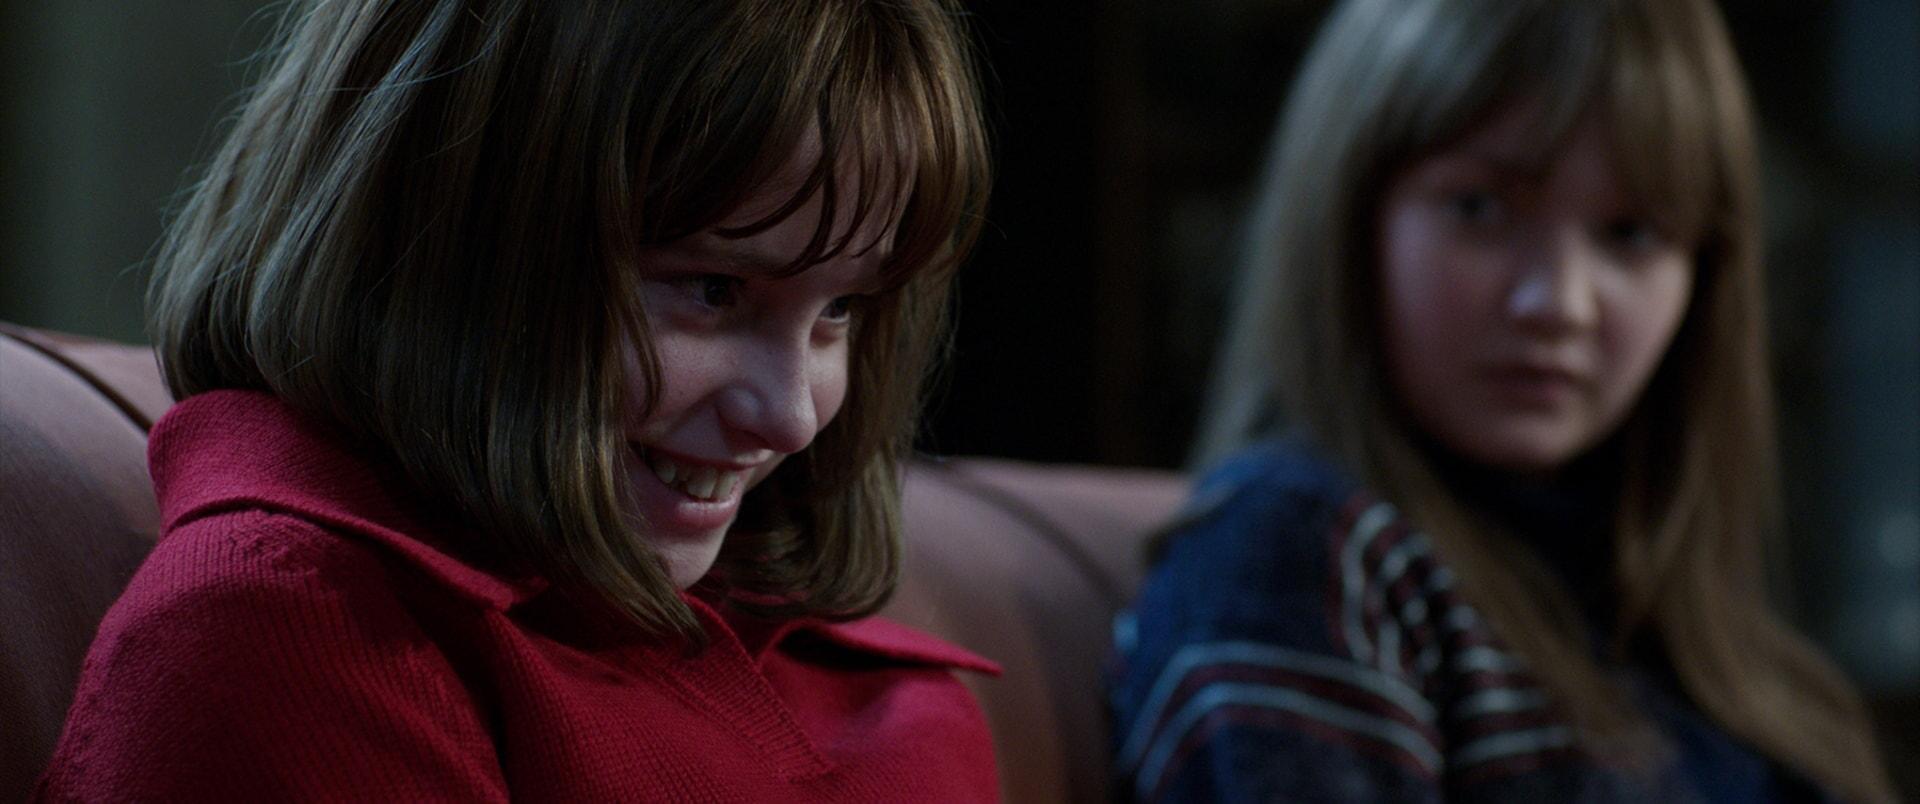 MADISON WOLFE as Janet Hodgson and LAUREN ESPOSITO as Margaret Hodgson